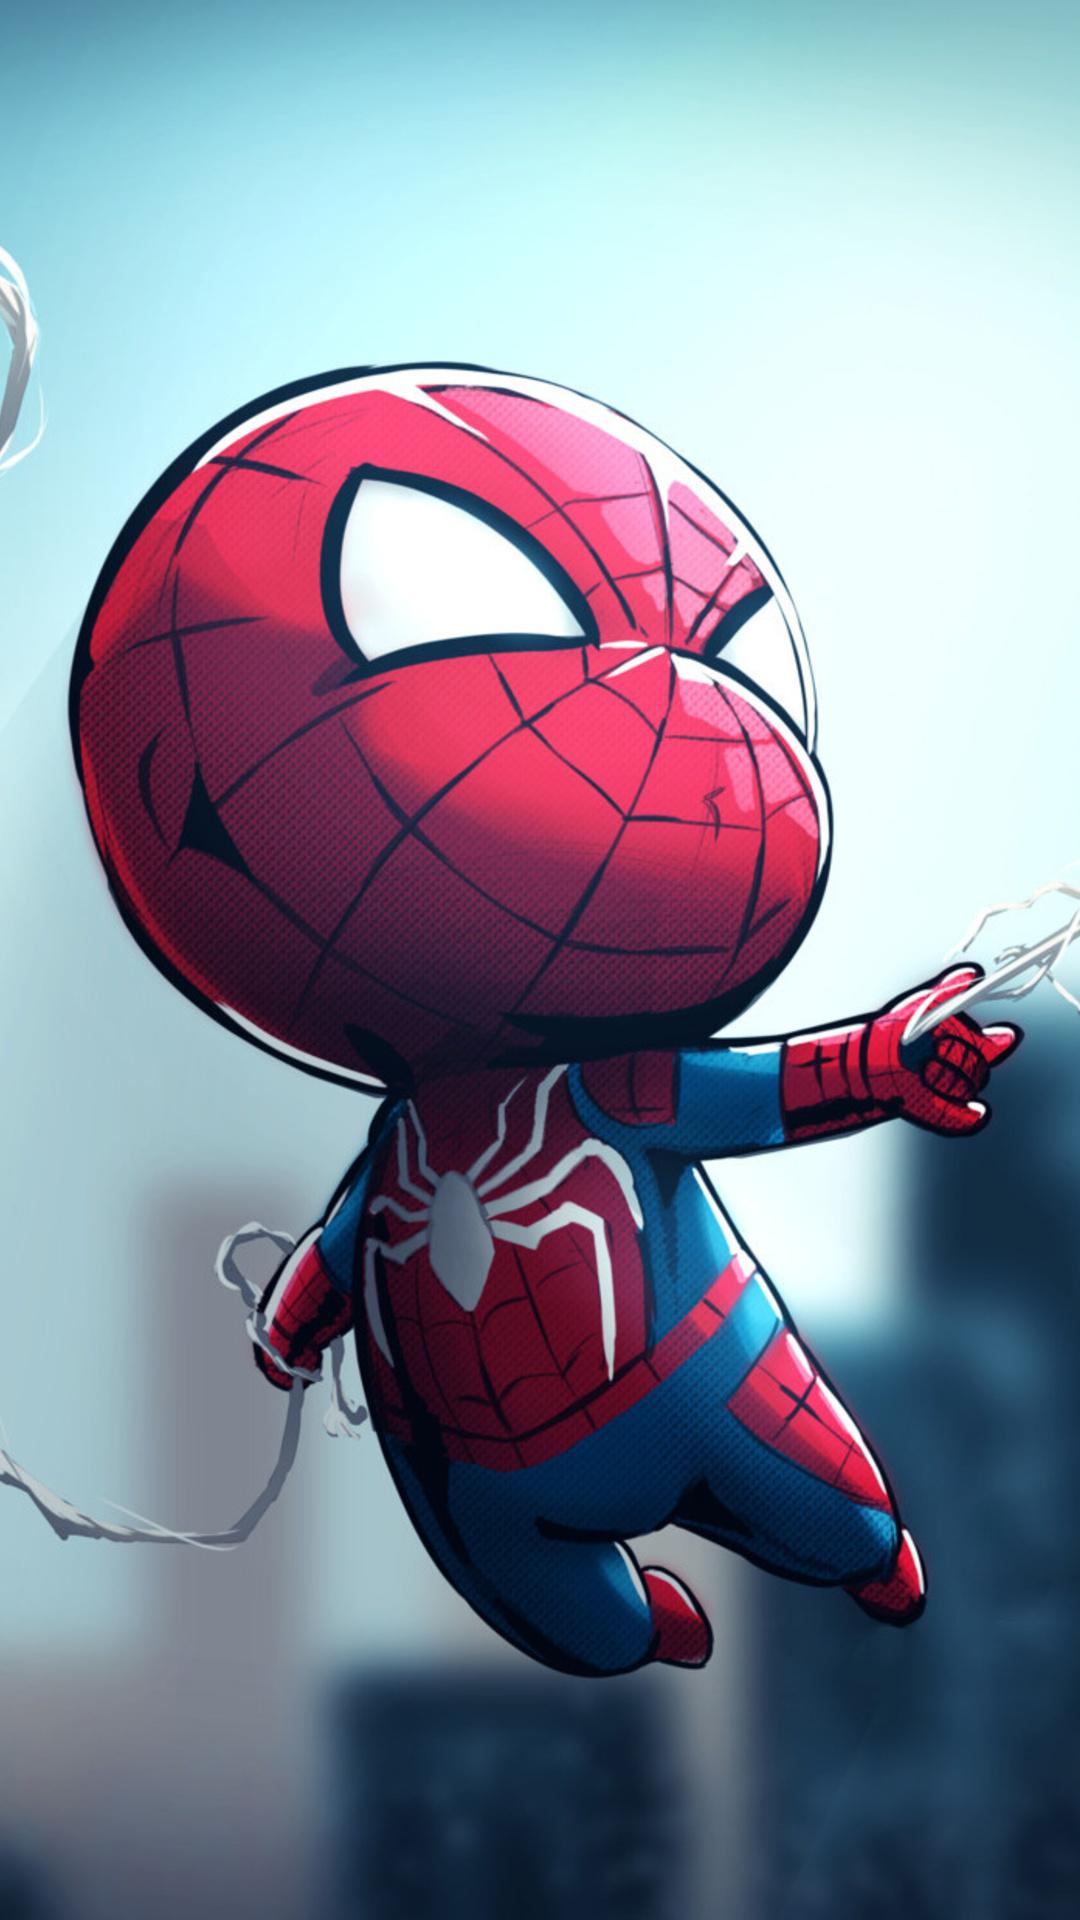 1080x1920 Chibi Spiderman Iphone 7,6s,6 Plus, Pixel xl ...